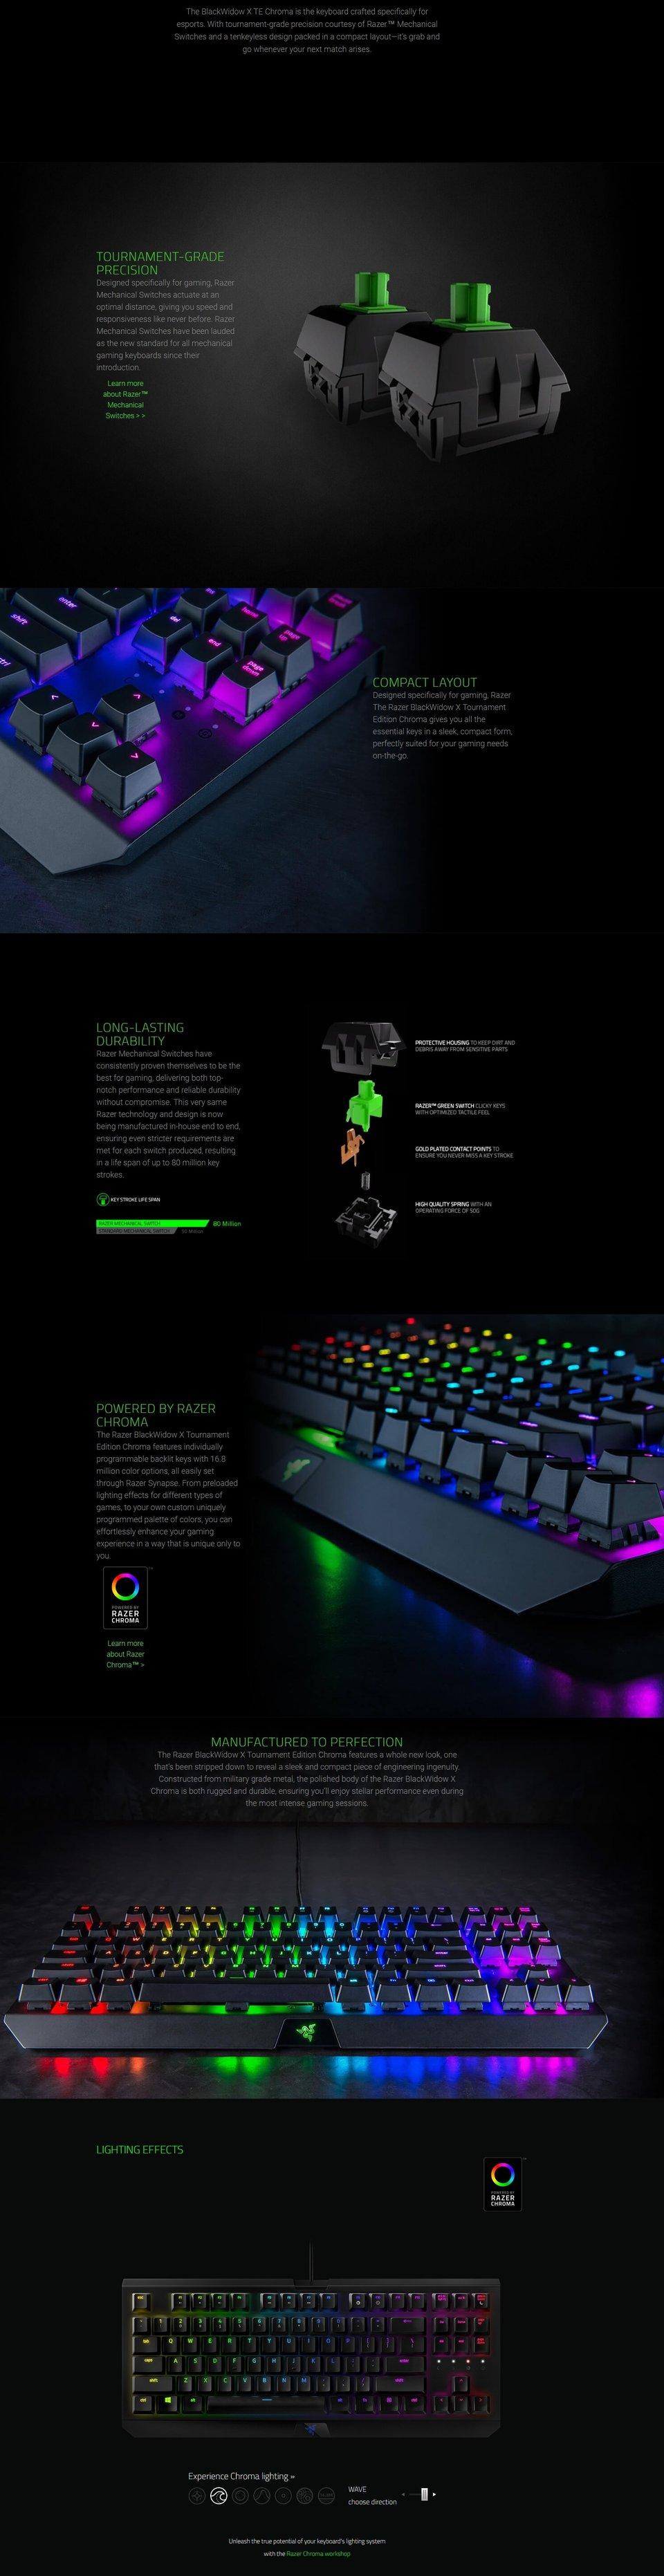 Razer Blackwidow X Tournament Edition Chroma Mechanical Usb Gaming Keyboard Te Product Description